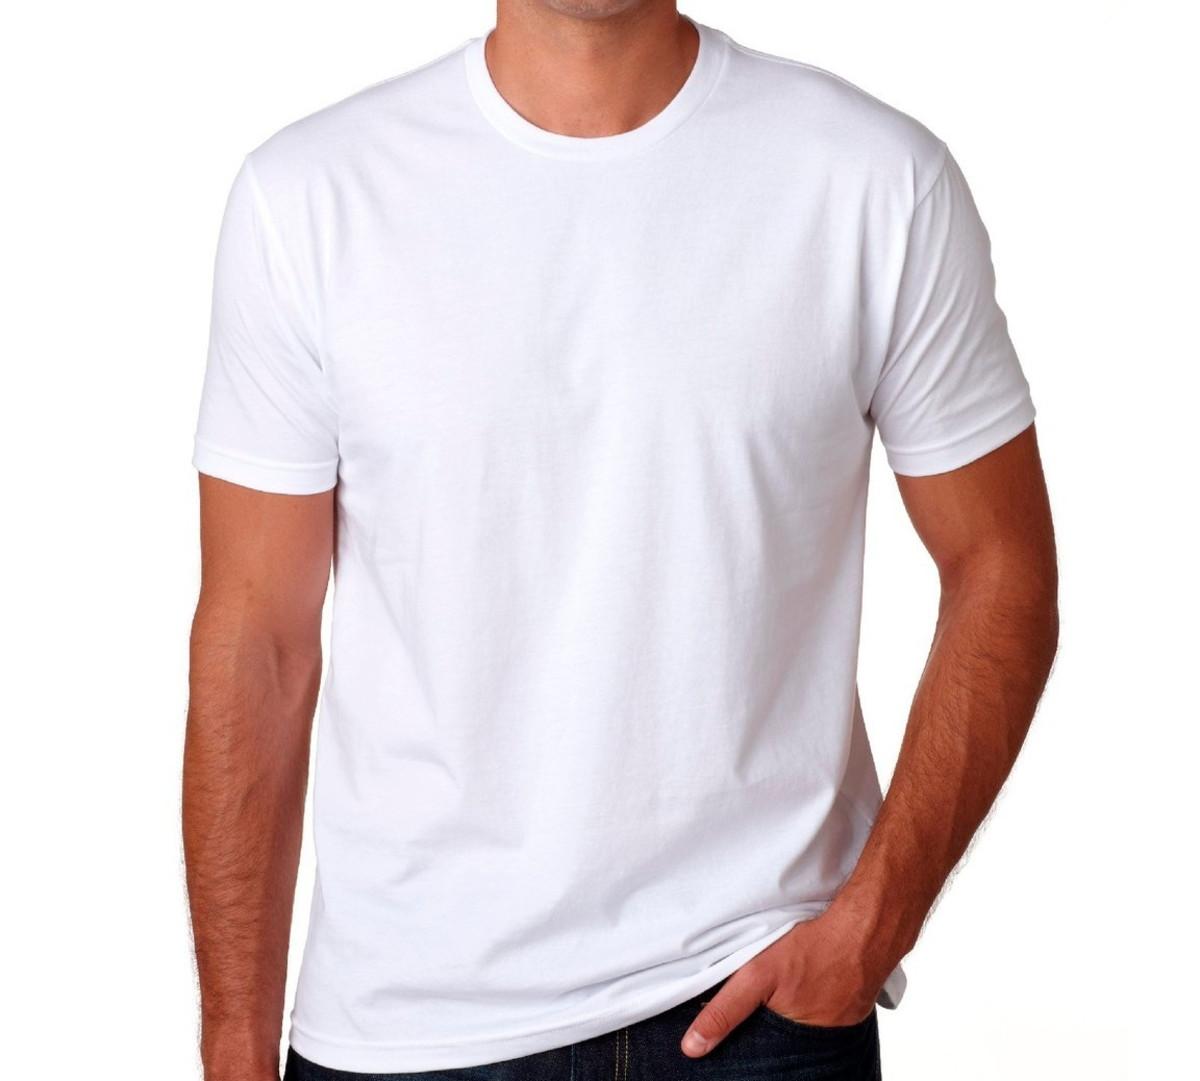 1cb831b82 Camiseta masculina básica manga curta gola redonda no Elo7 ...